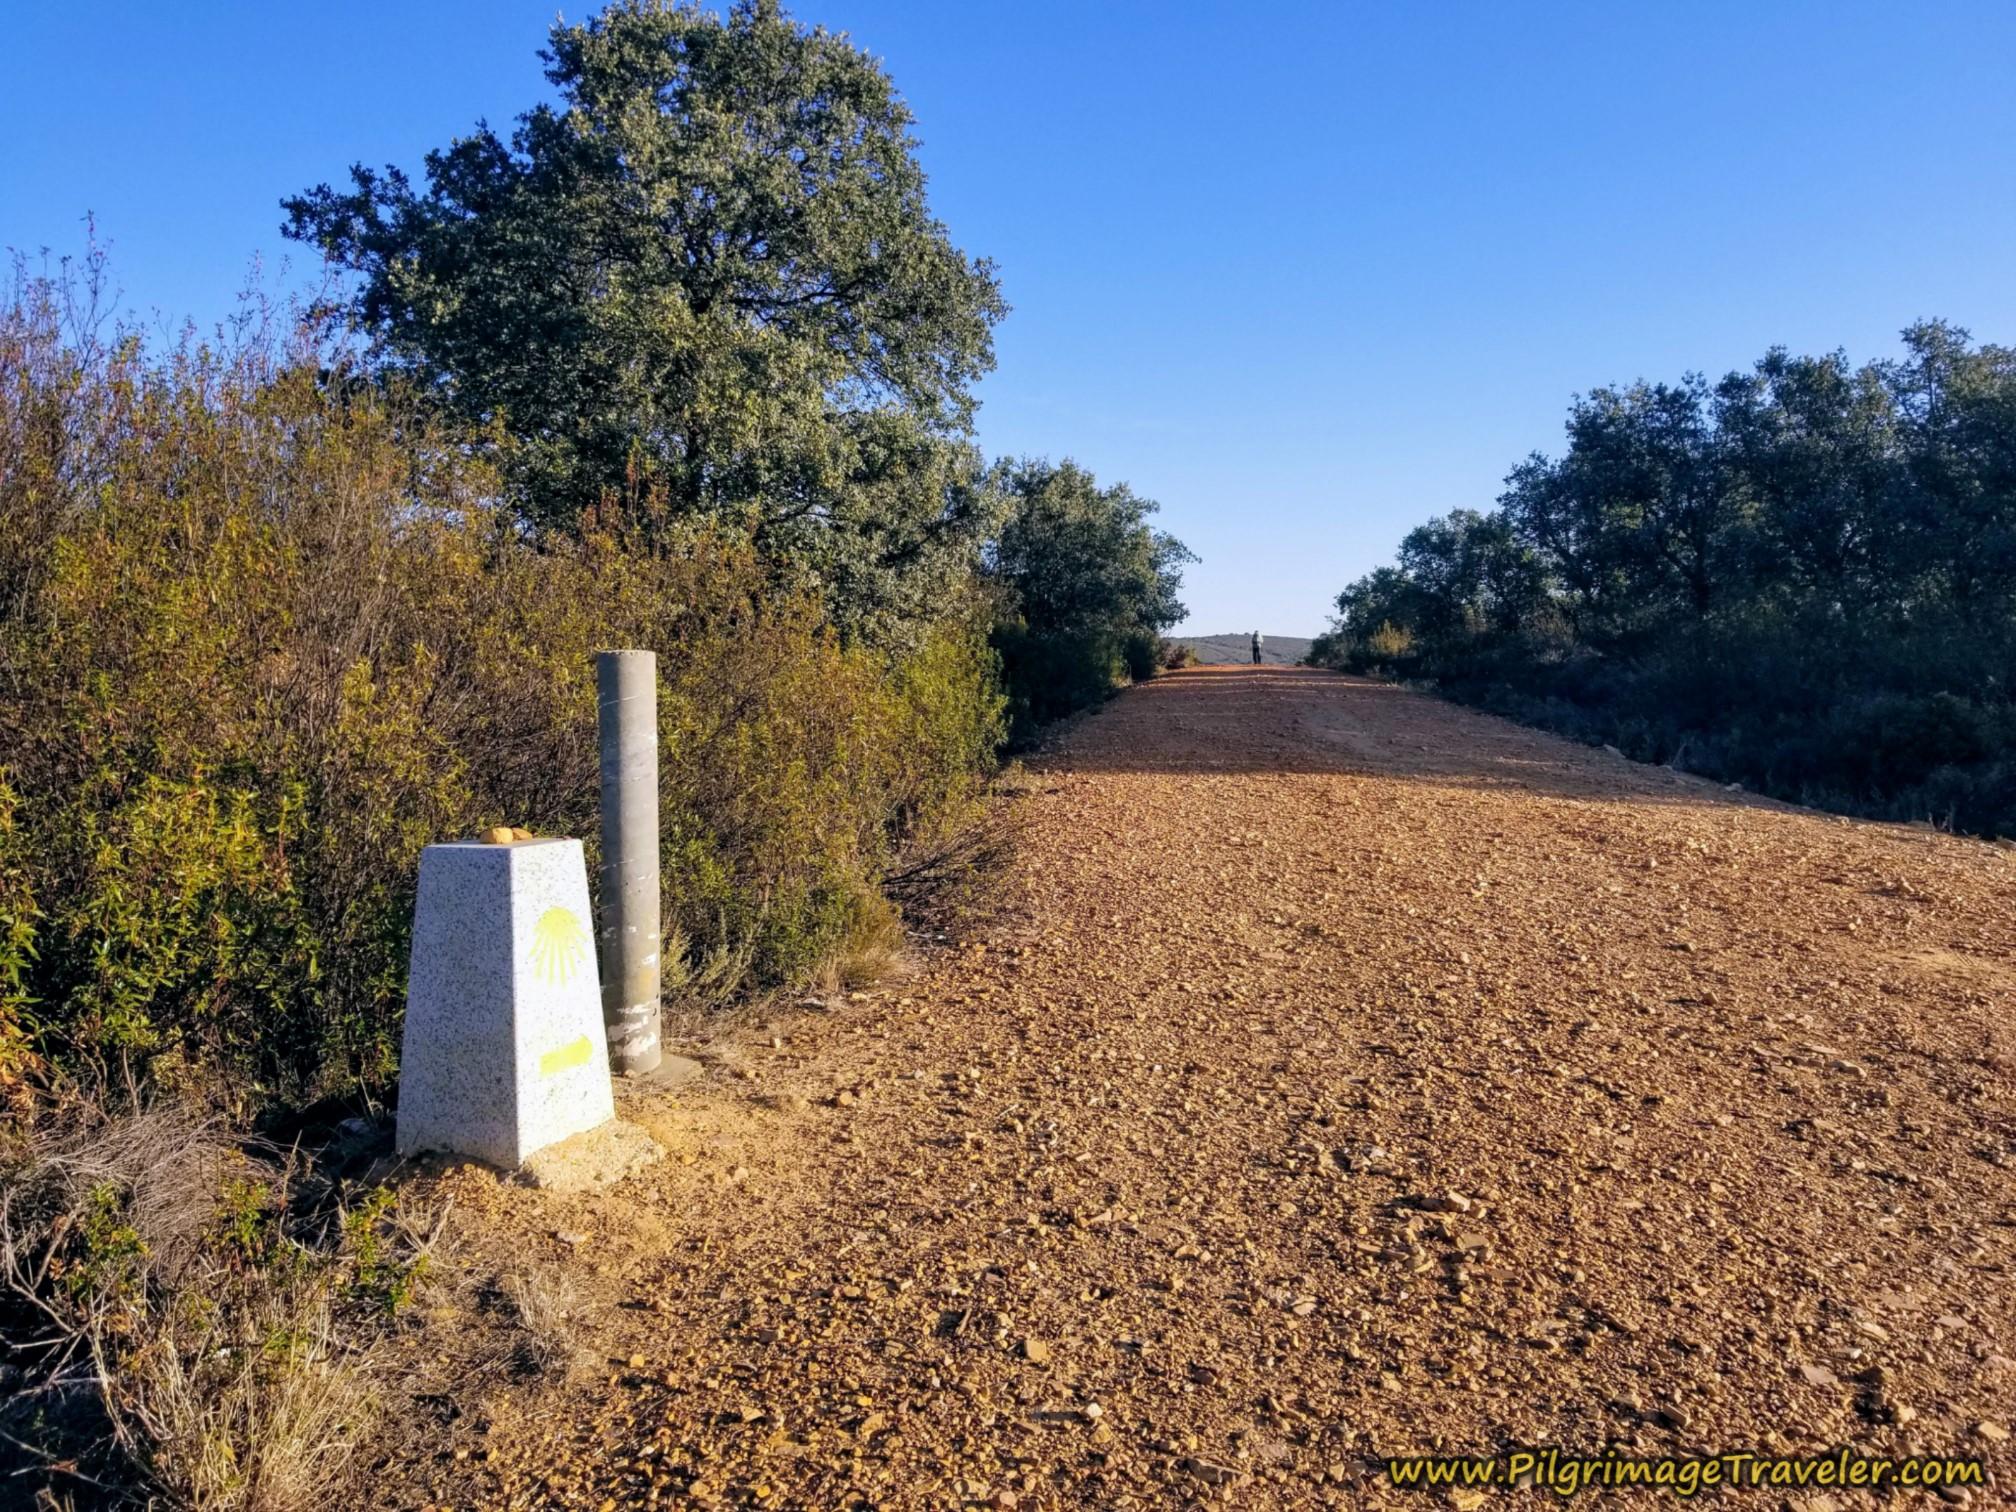 New Waymark at Top on the Camino Sanabrés from Tábara to Santa Marta de Tera